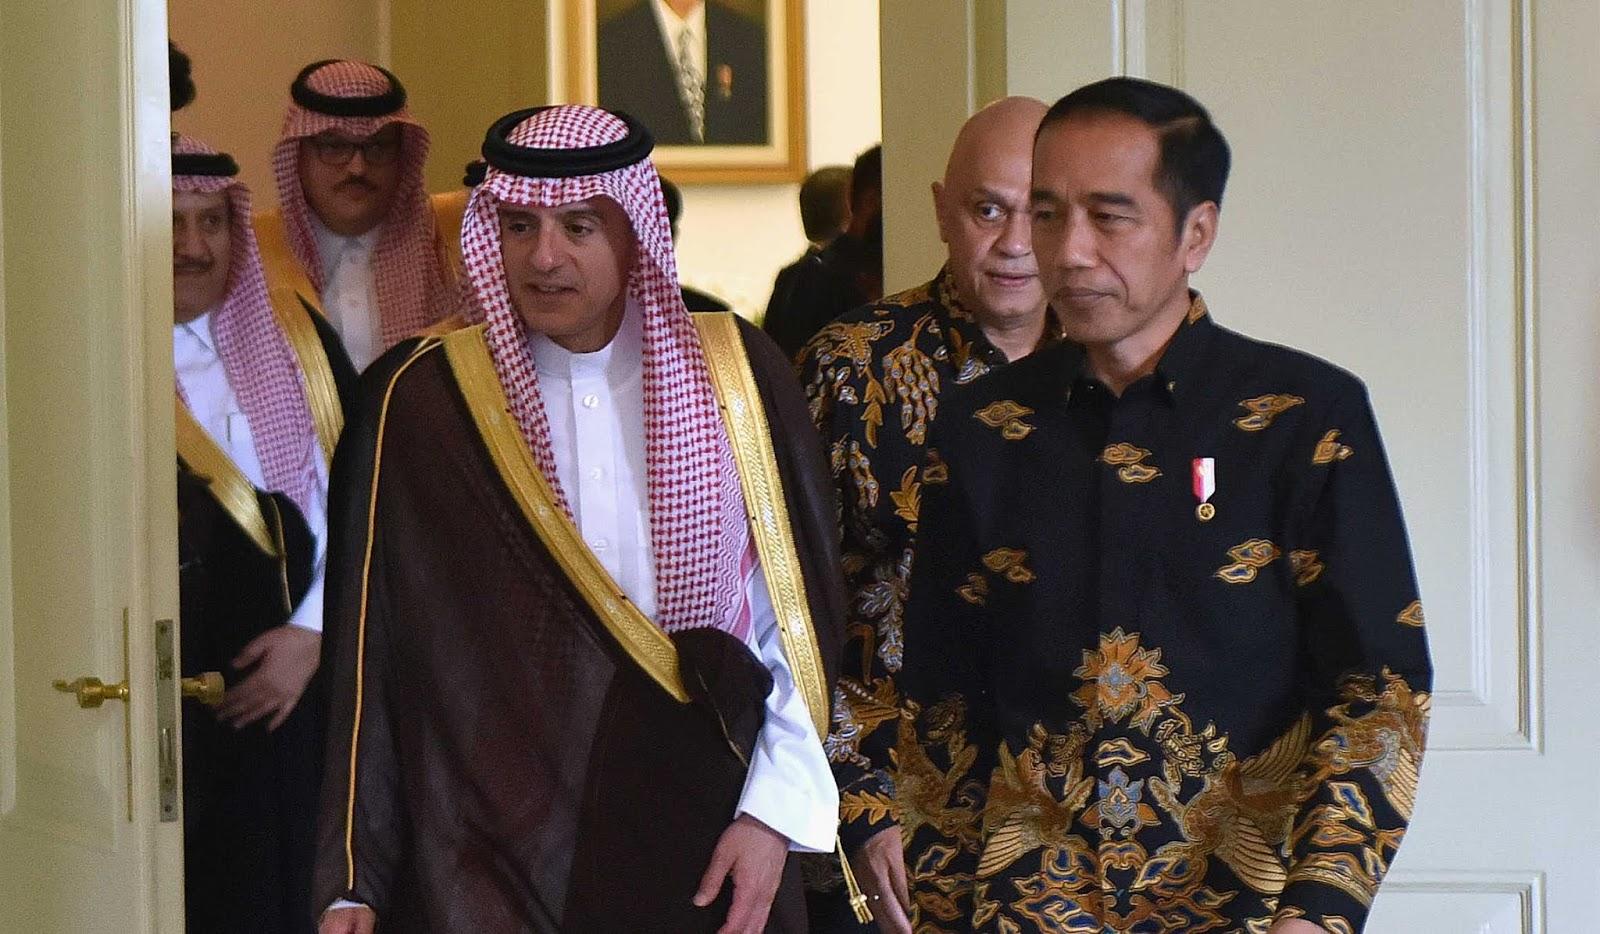 Presiden Jokowi Terima Menlu Arab Saudi, dan Sampaikan Keprihatinan Atas Kasus Khashoggi